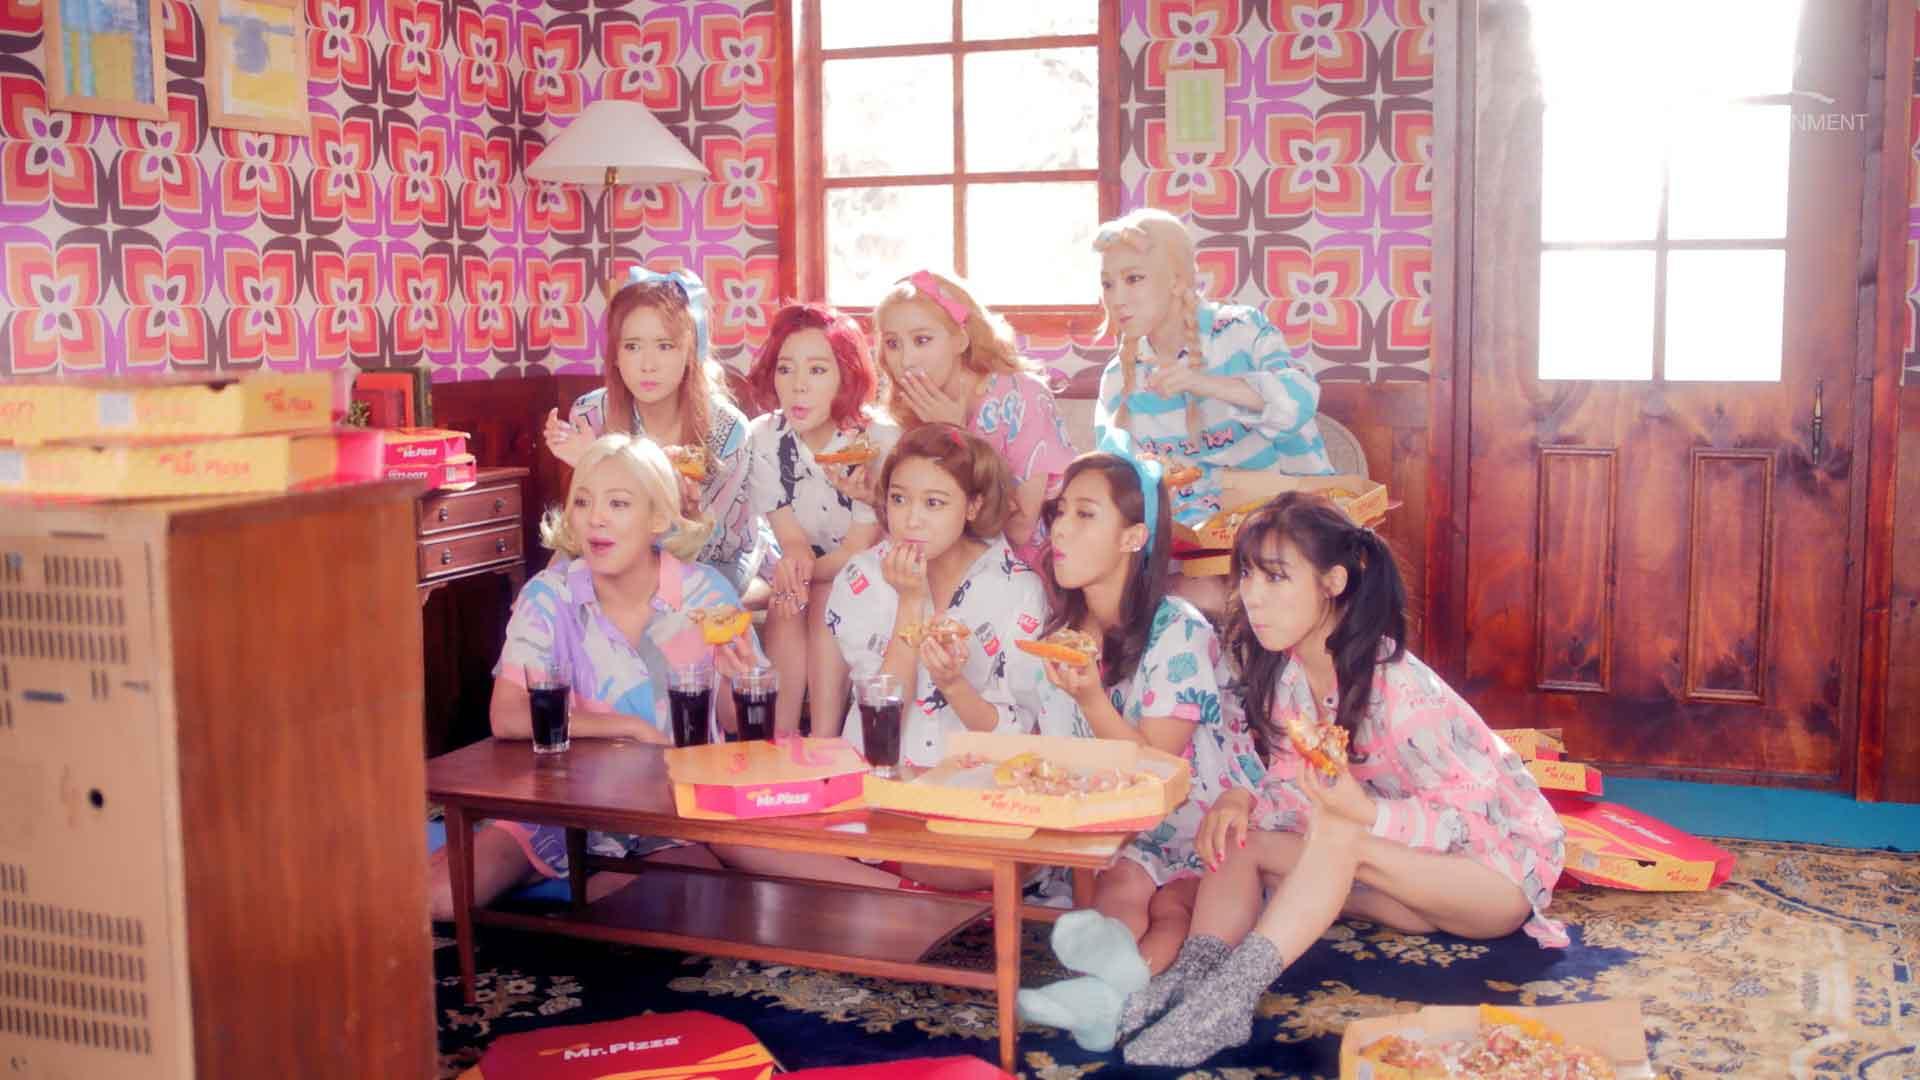 [1080P] 少女時代Girls' Generation - Lion Heart (Bugs - 976M)